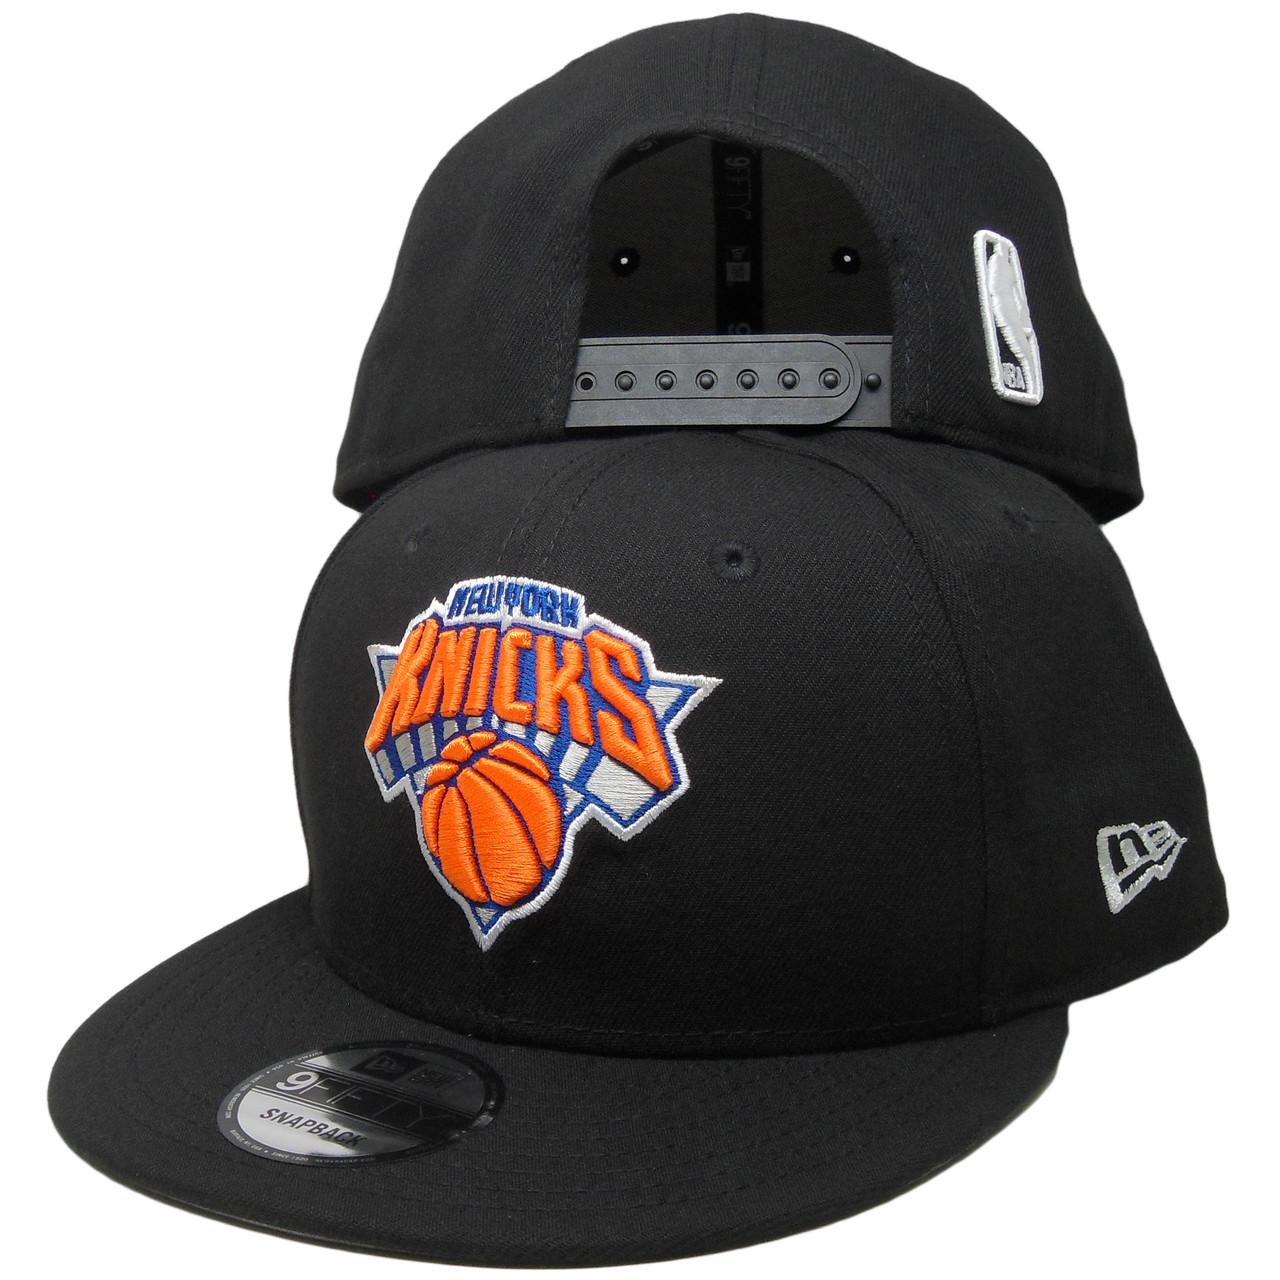 best service d7341 fba7e New York Knicks New Era Basic 9Fifty Snapback - Black, Orange, Royal Blue -  ECapsUnlimited.com